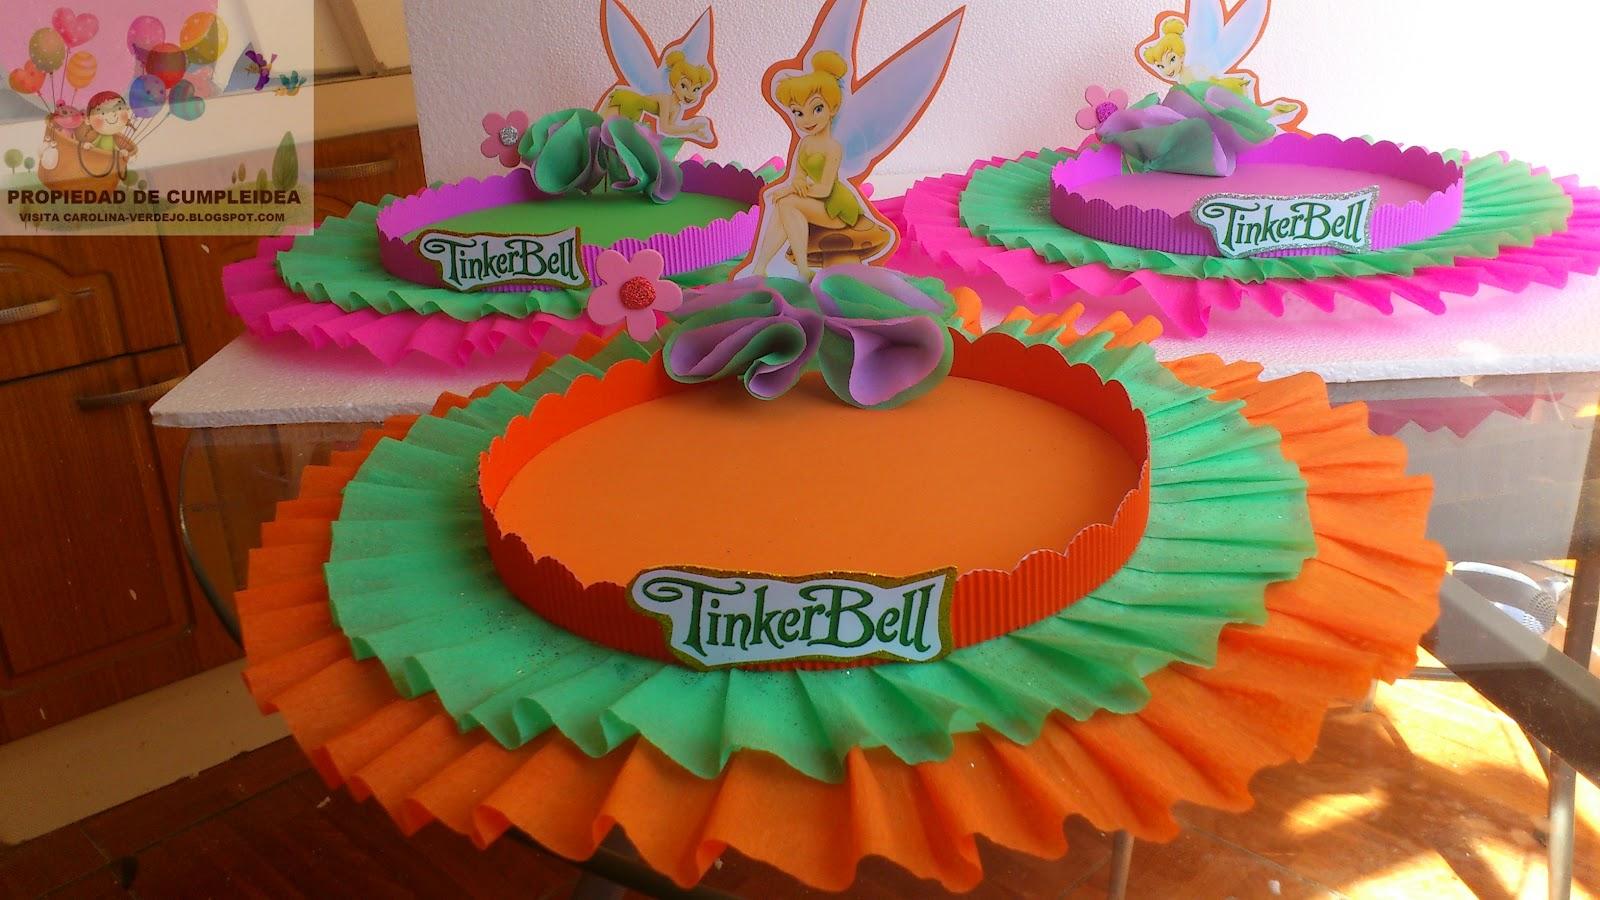 DECORACIONES INFANTILES: TINKERBELL